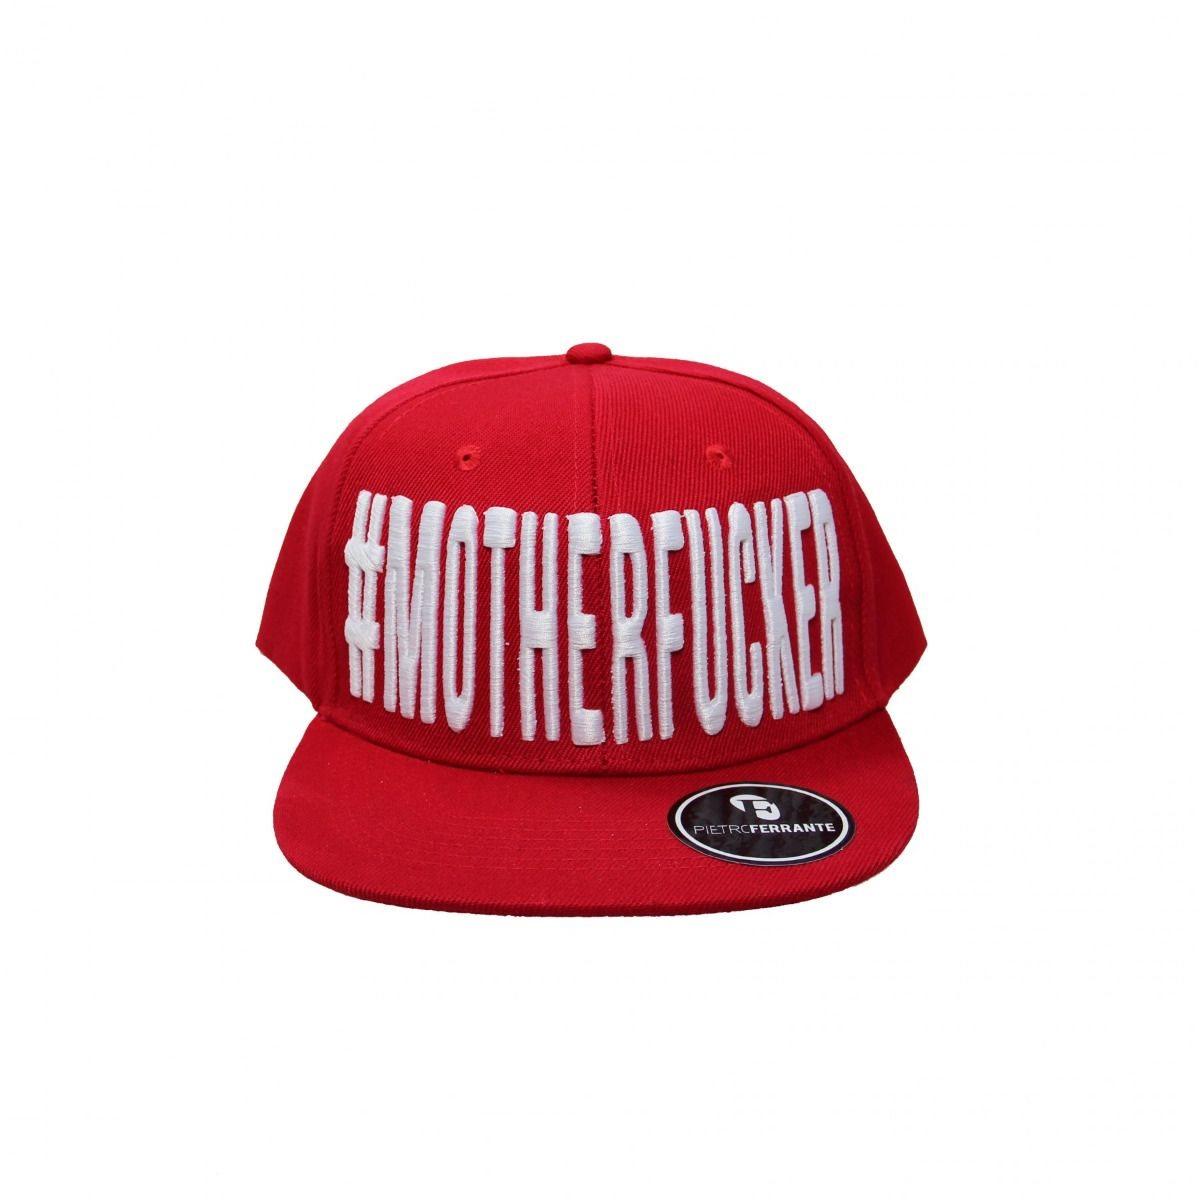 Cappello #MotherFucker - Rosso